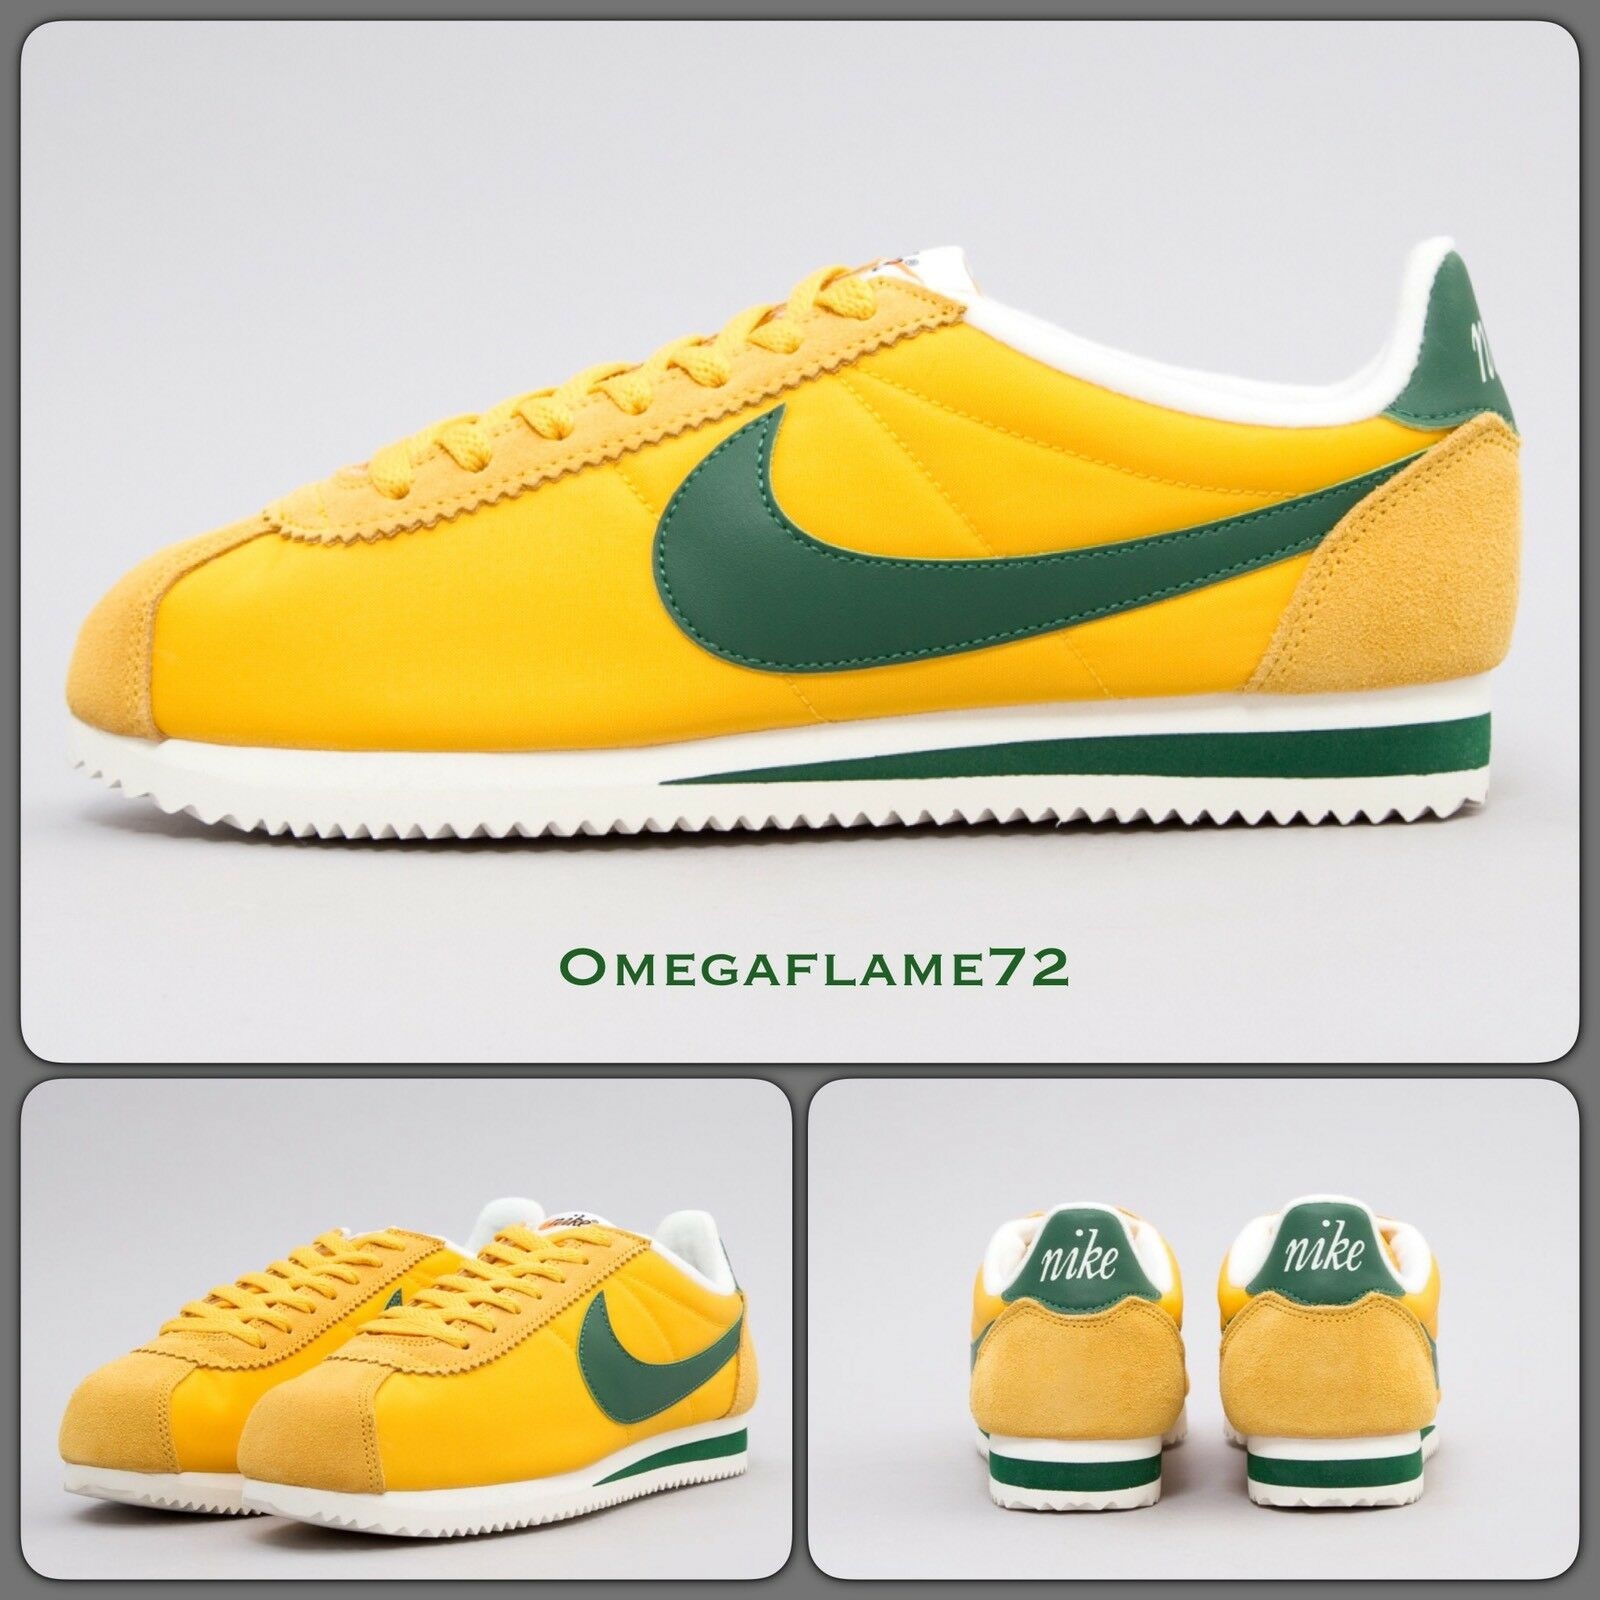 Nike Cortez Nylon Prem Oregon Ducks,10.5 876873-700 EU 45.5 US 11.5 876873-700 Ducks,10.5 9a1e96